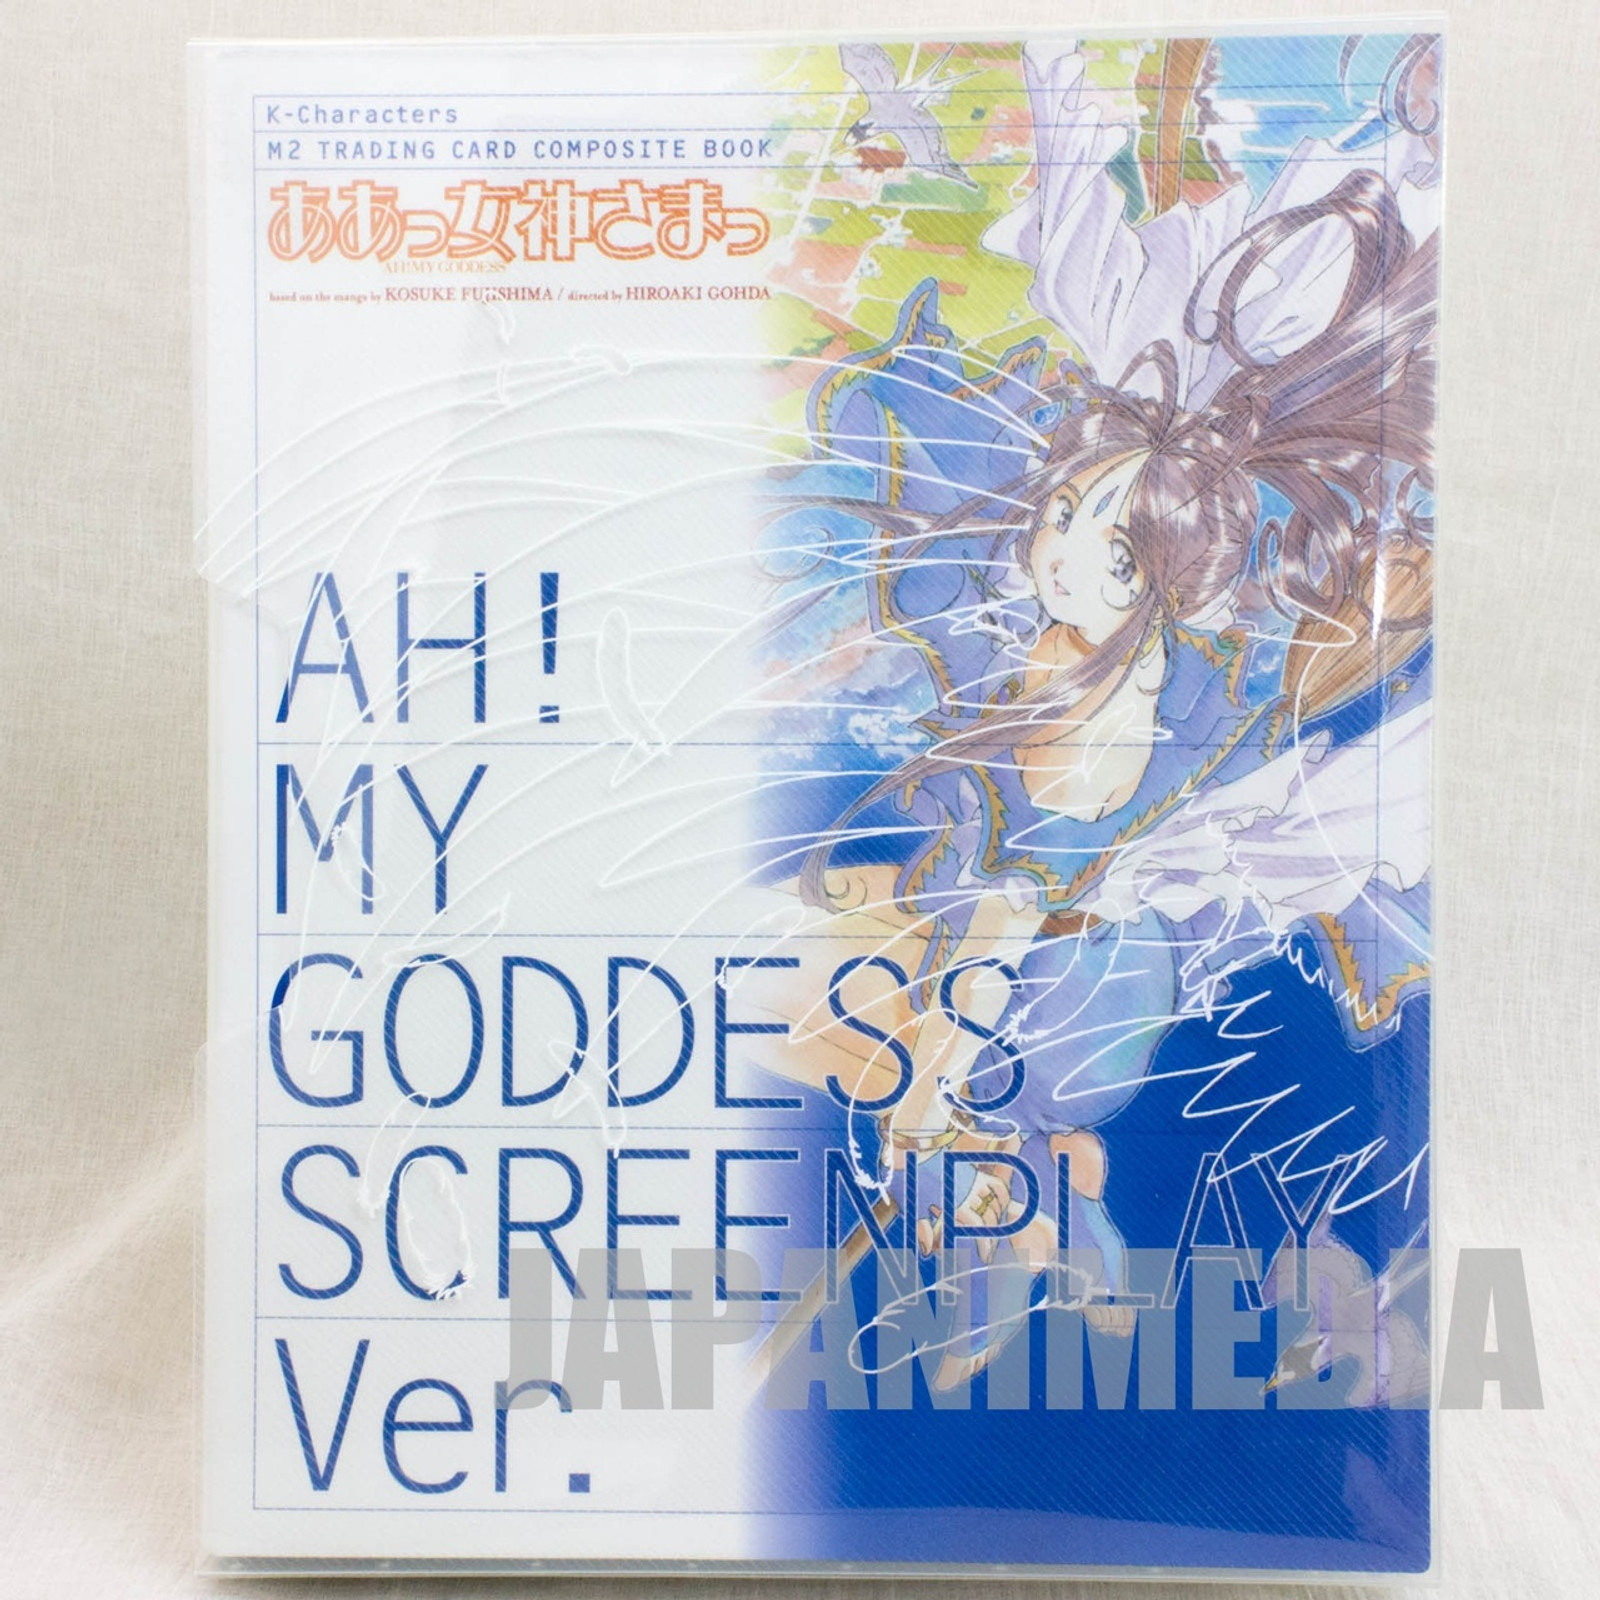 Ah! My Goddess Screnplay Ver. Belldandy Trading Card Composite Book JAPAN